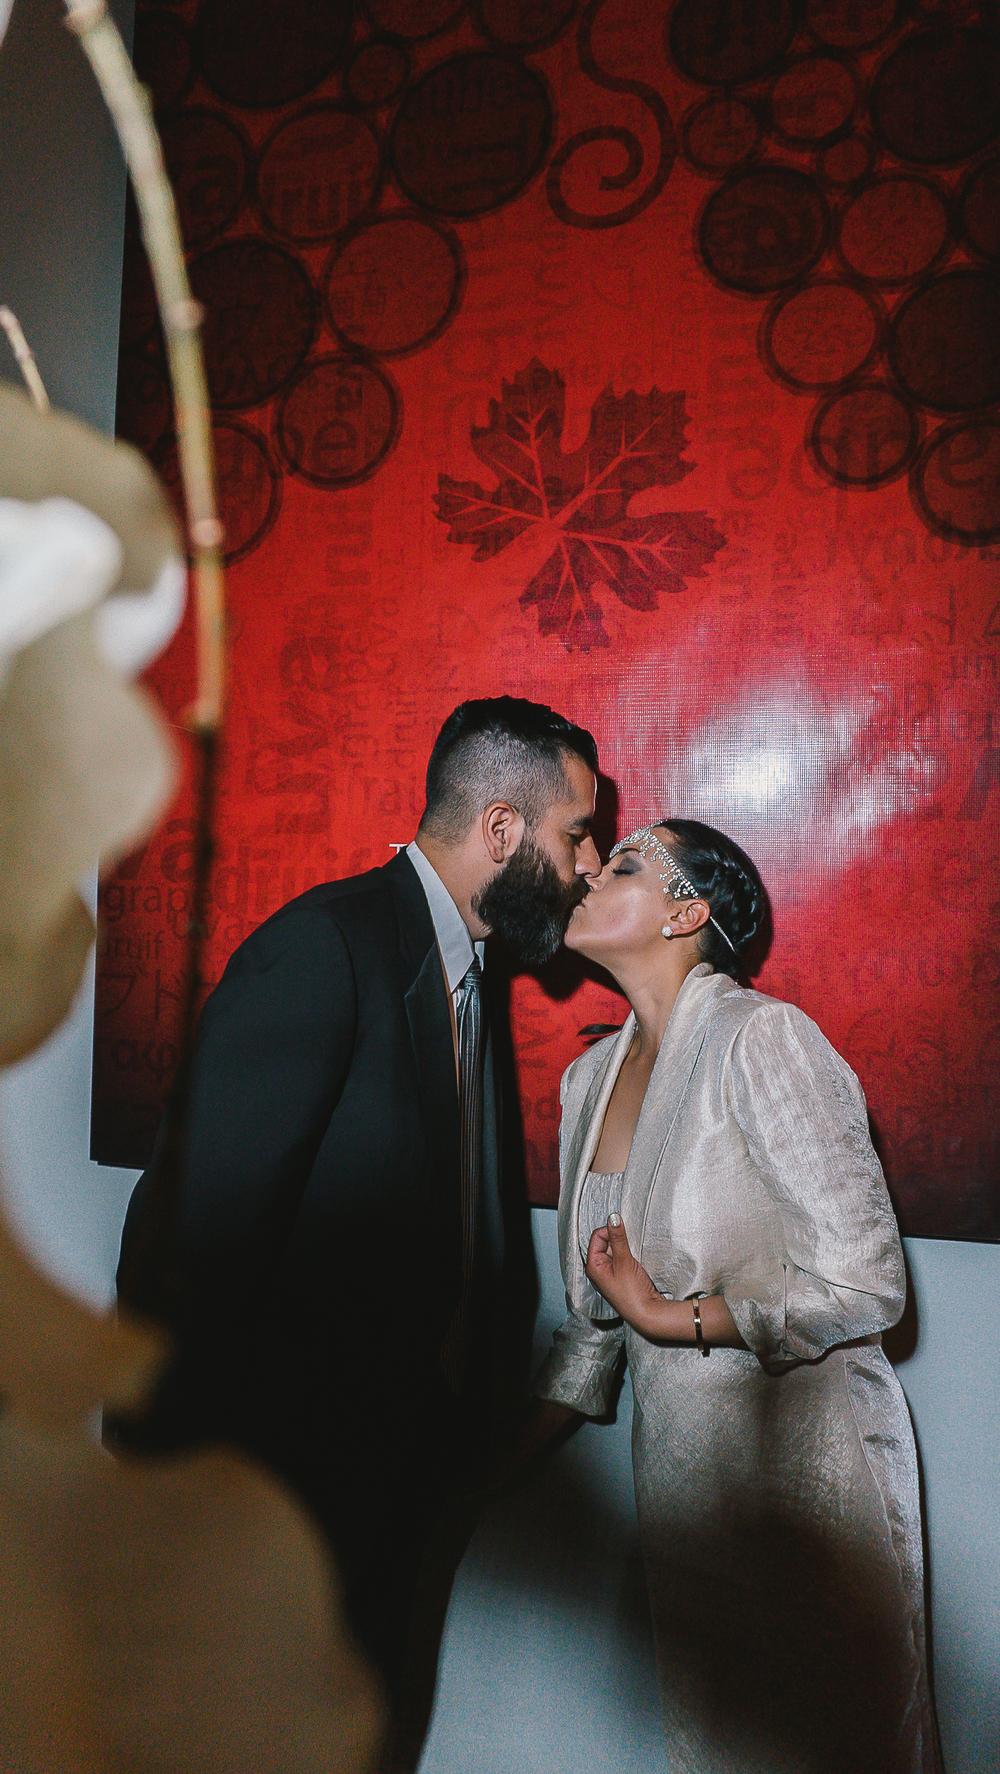 Boda Bistro Mecha Toluca, Pau y Beto boda mexico